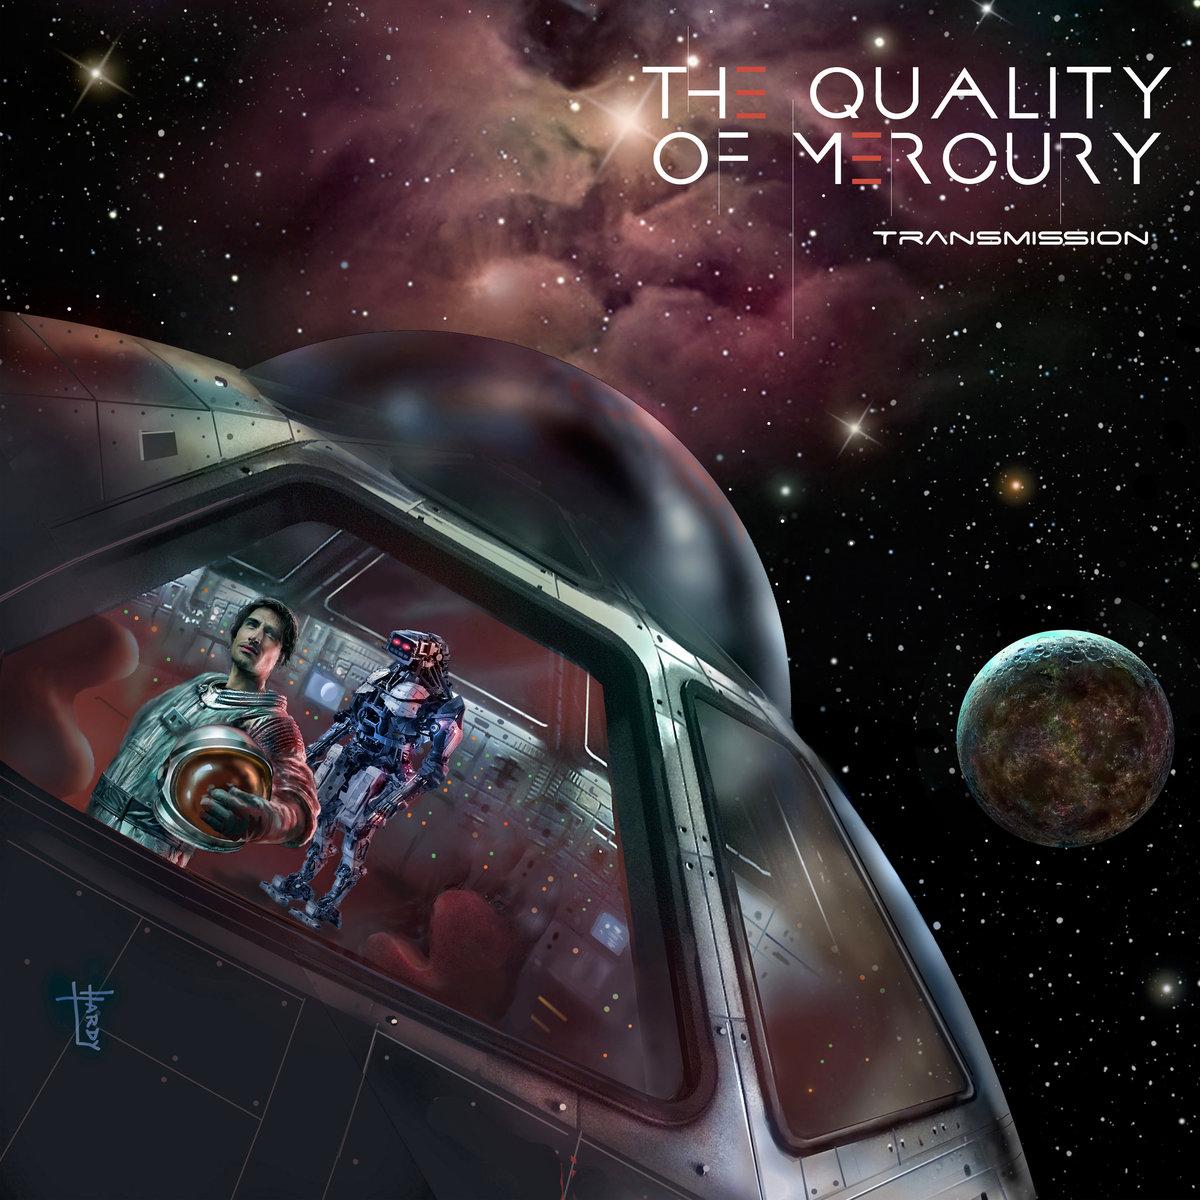 The Quality Of Mercury - Transmission